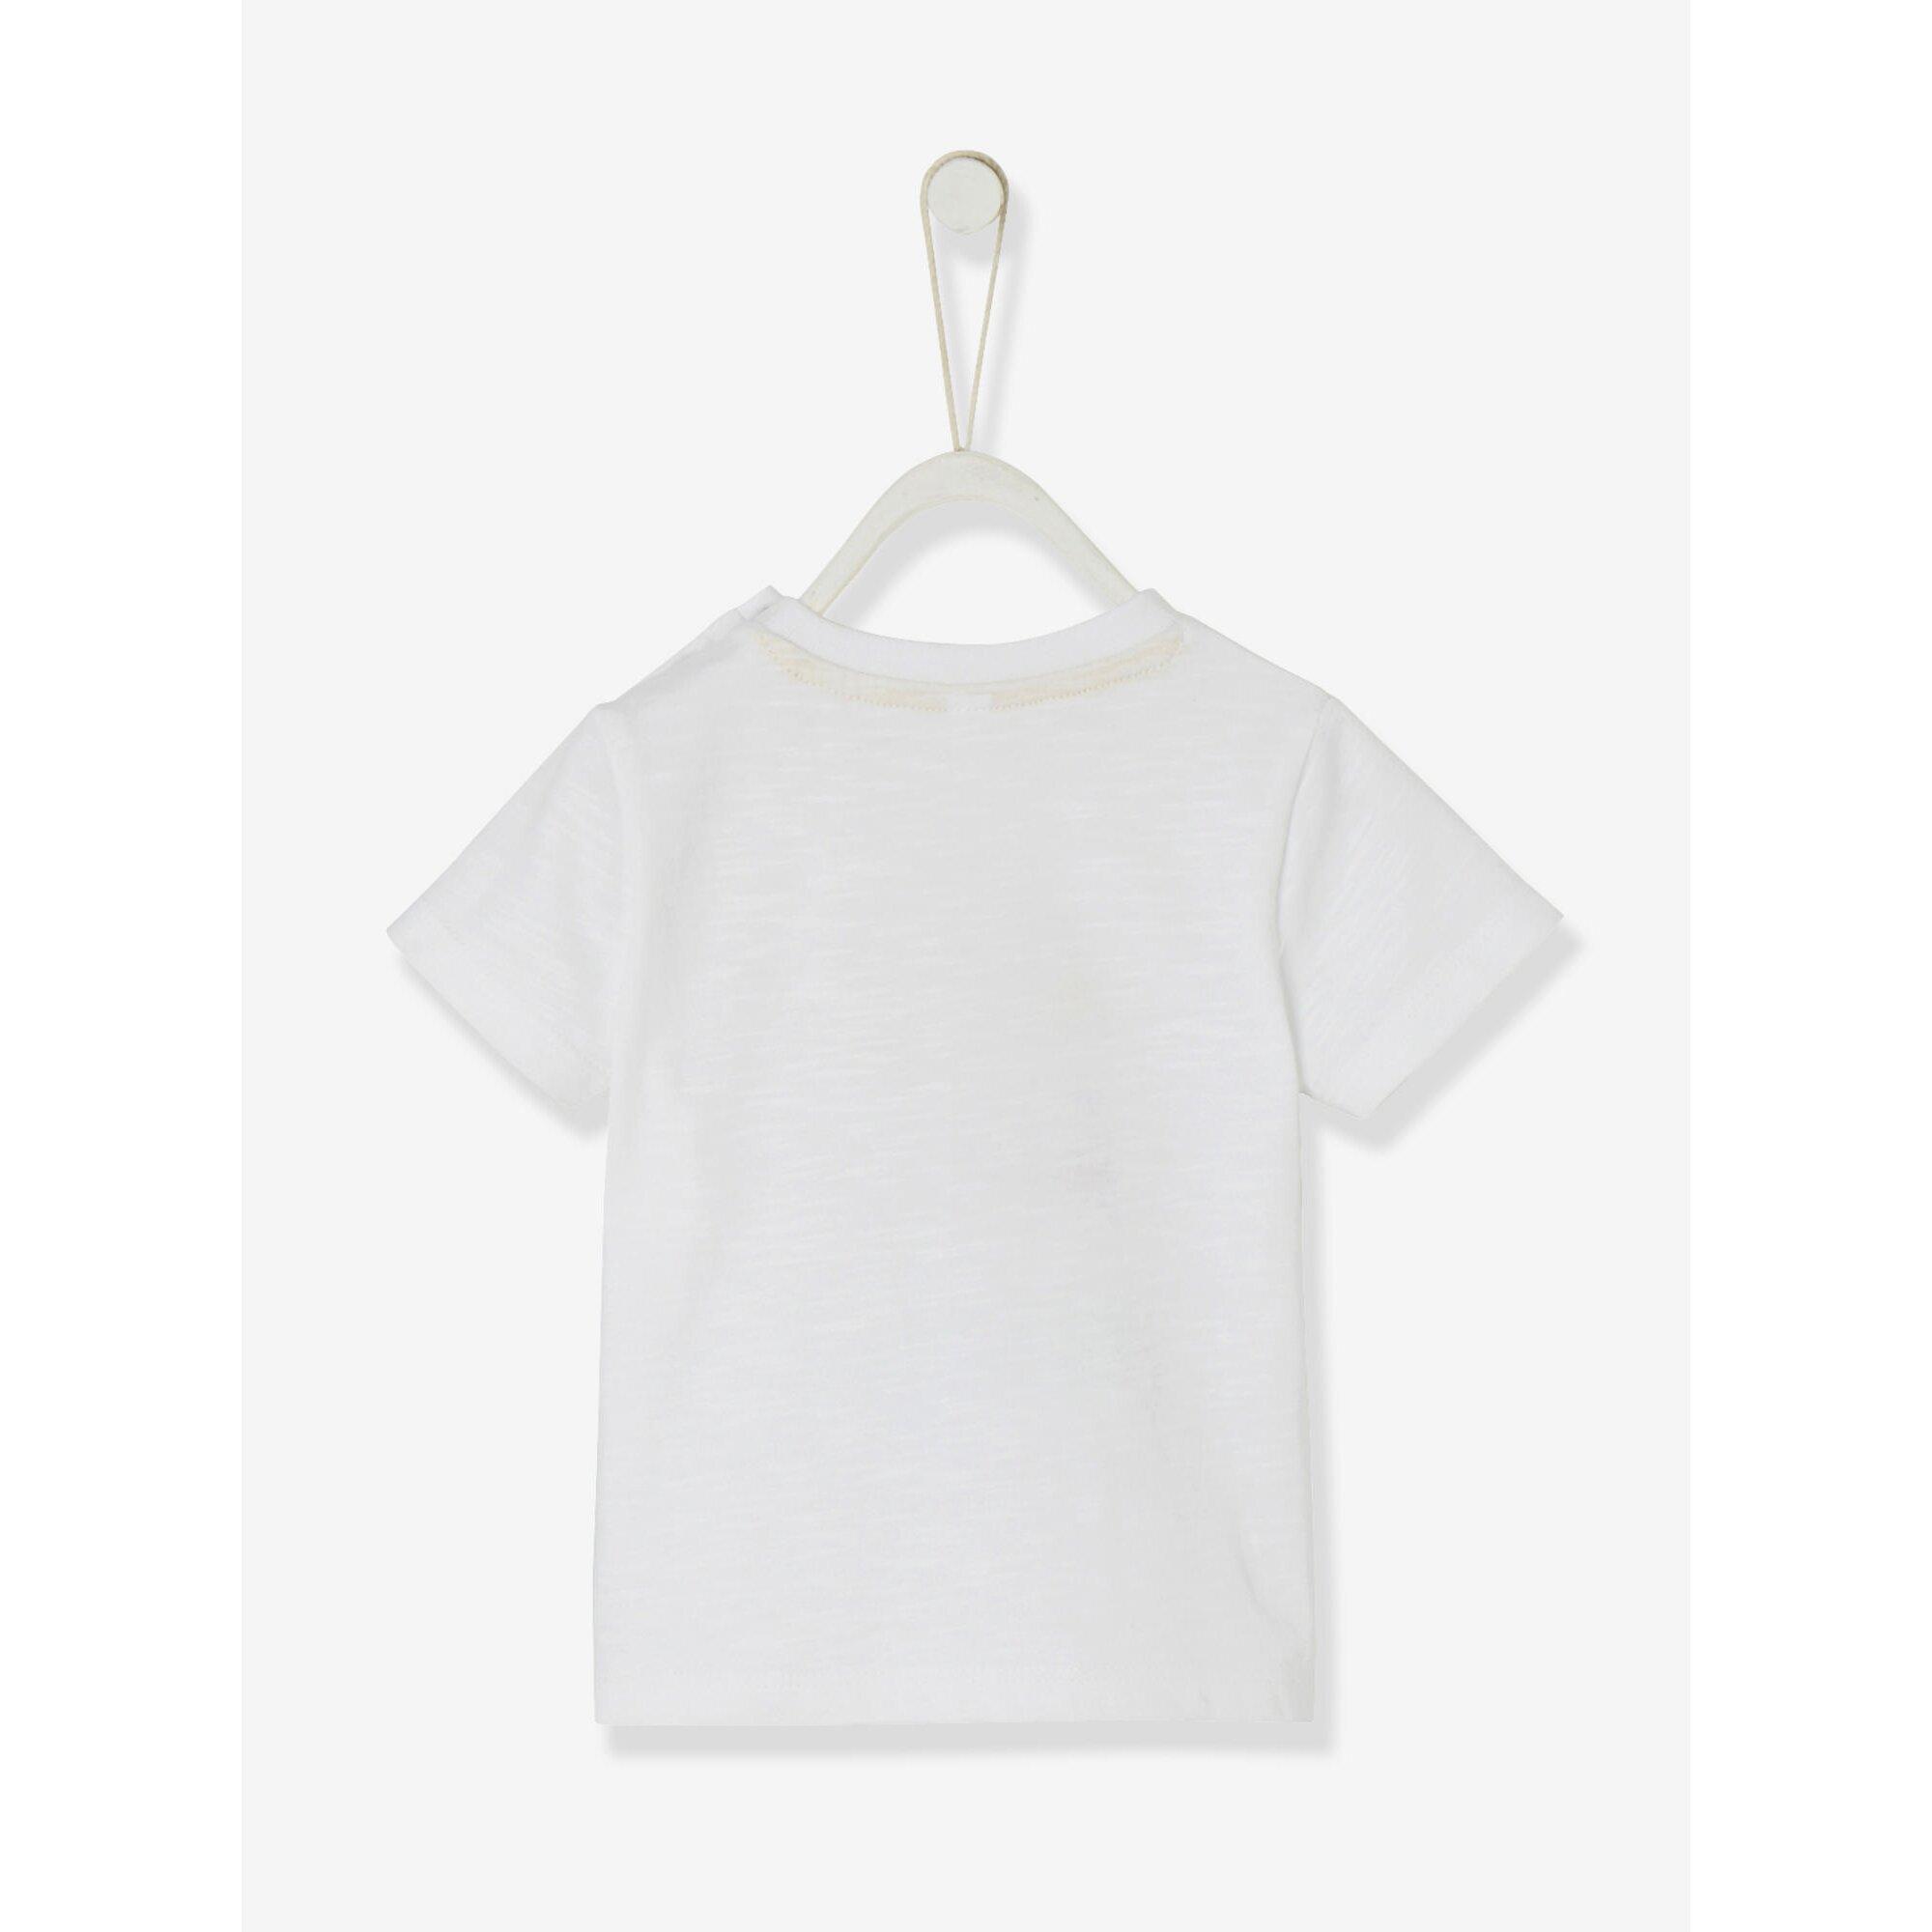 vertbaudet-baby-jungen-t-shirt-auto-print, 5.59 EUR @ babywalz-de